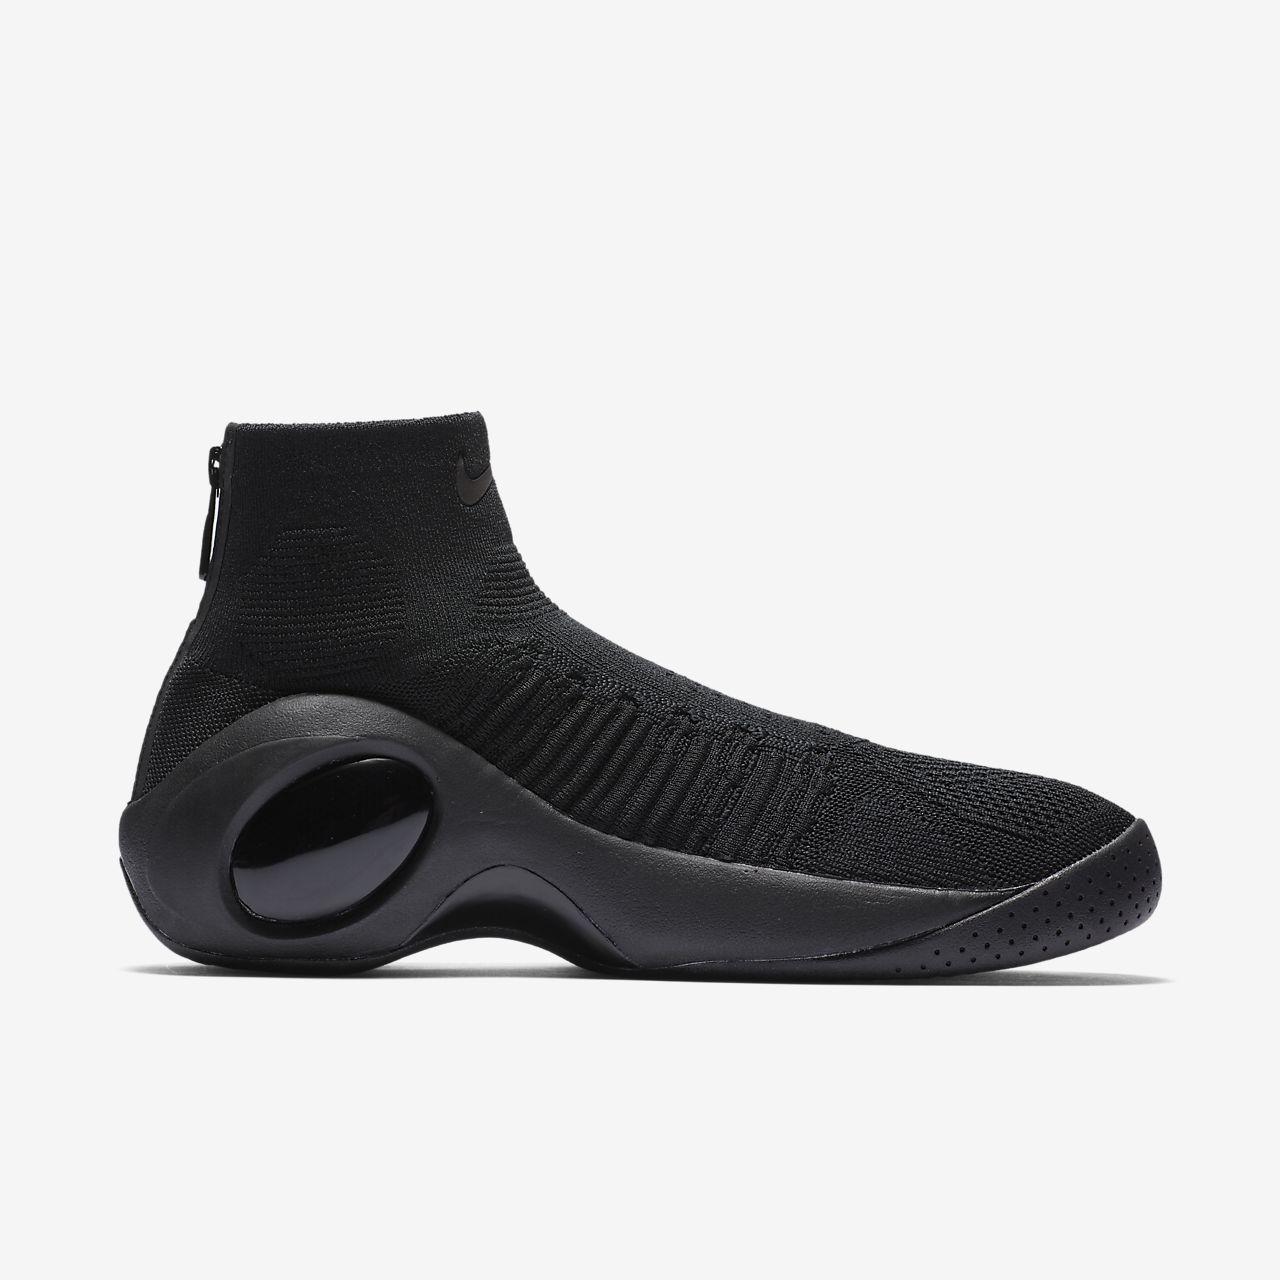 buy popular 7b34a cdaba Chaussure Nike Flight Bonafide pour Homme